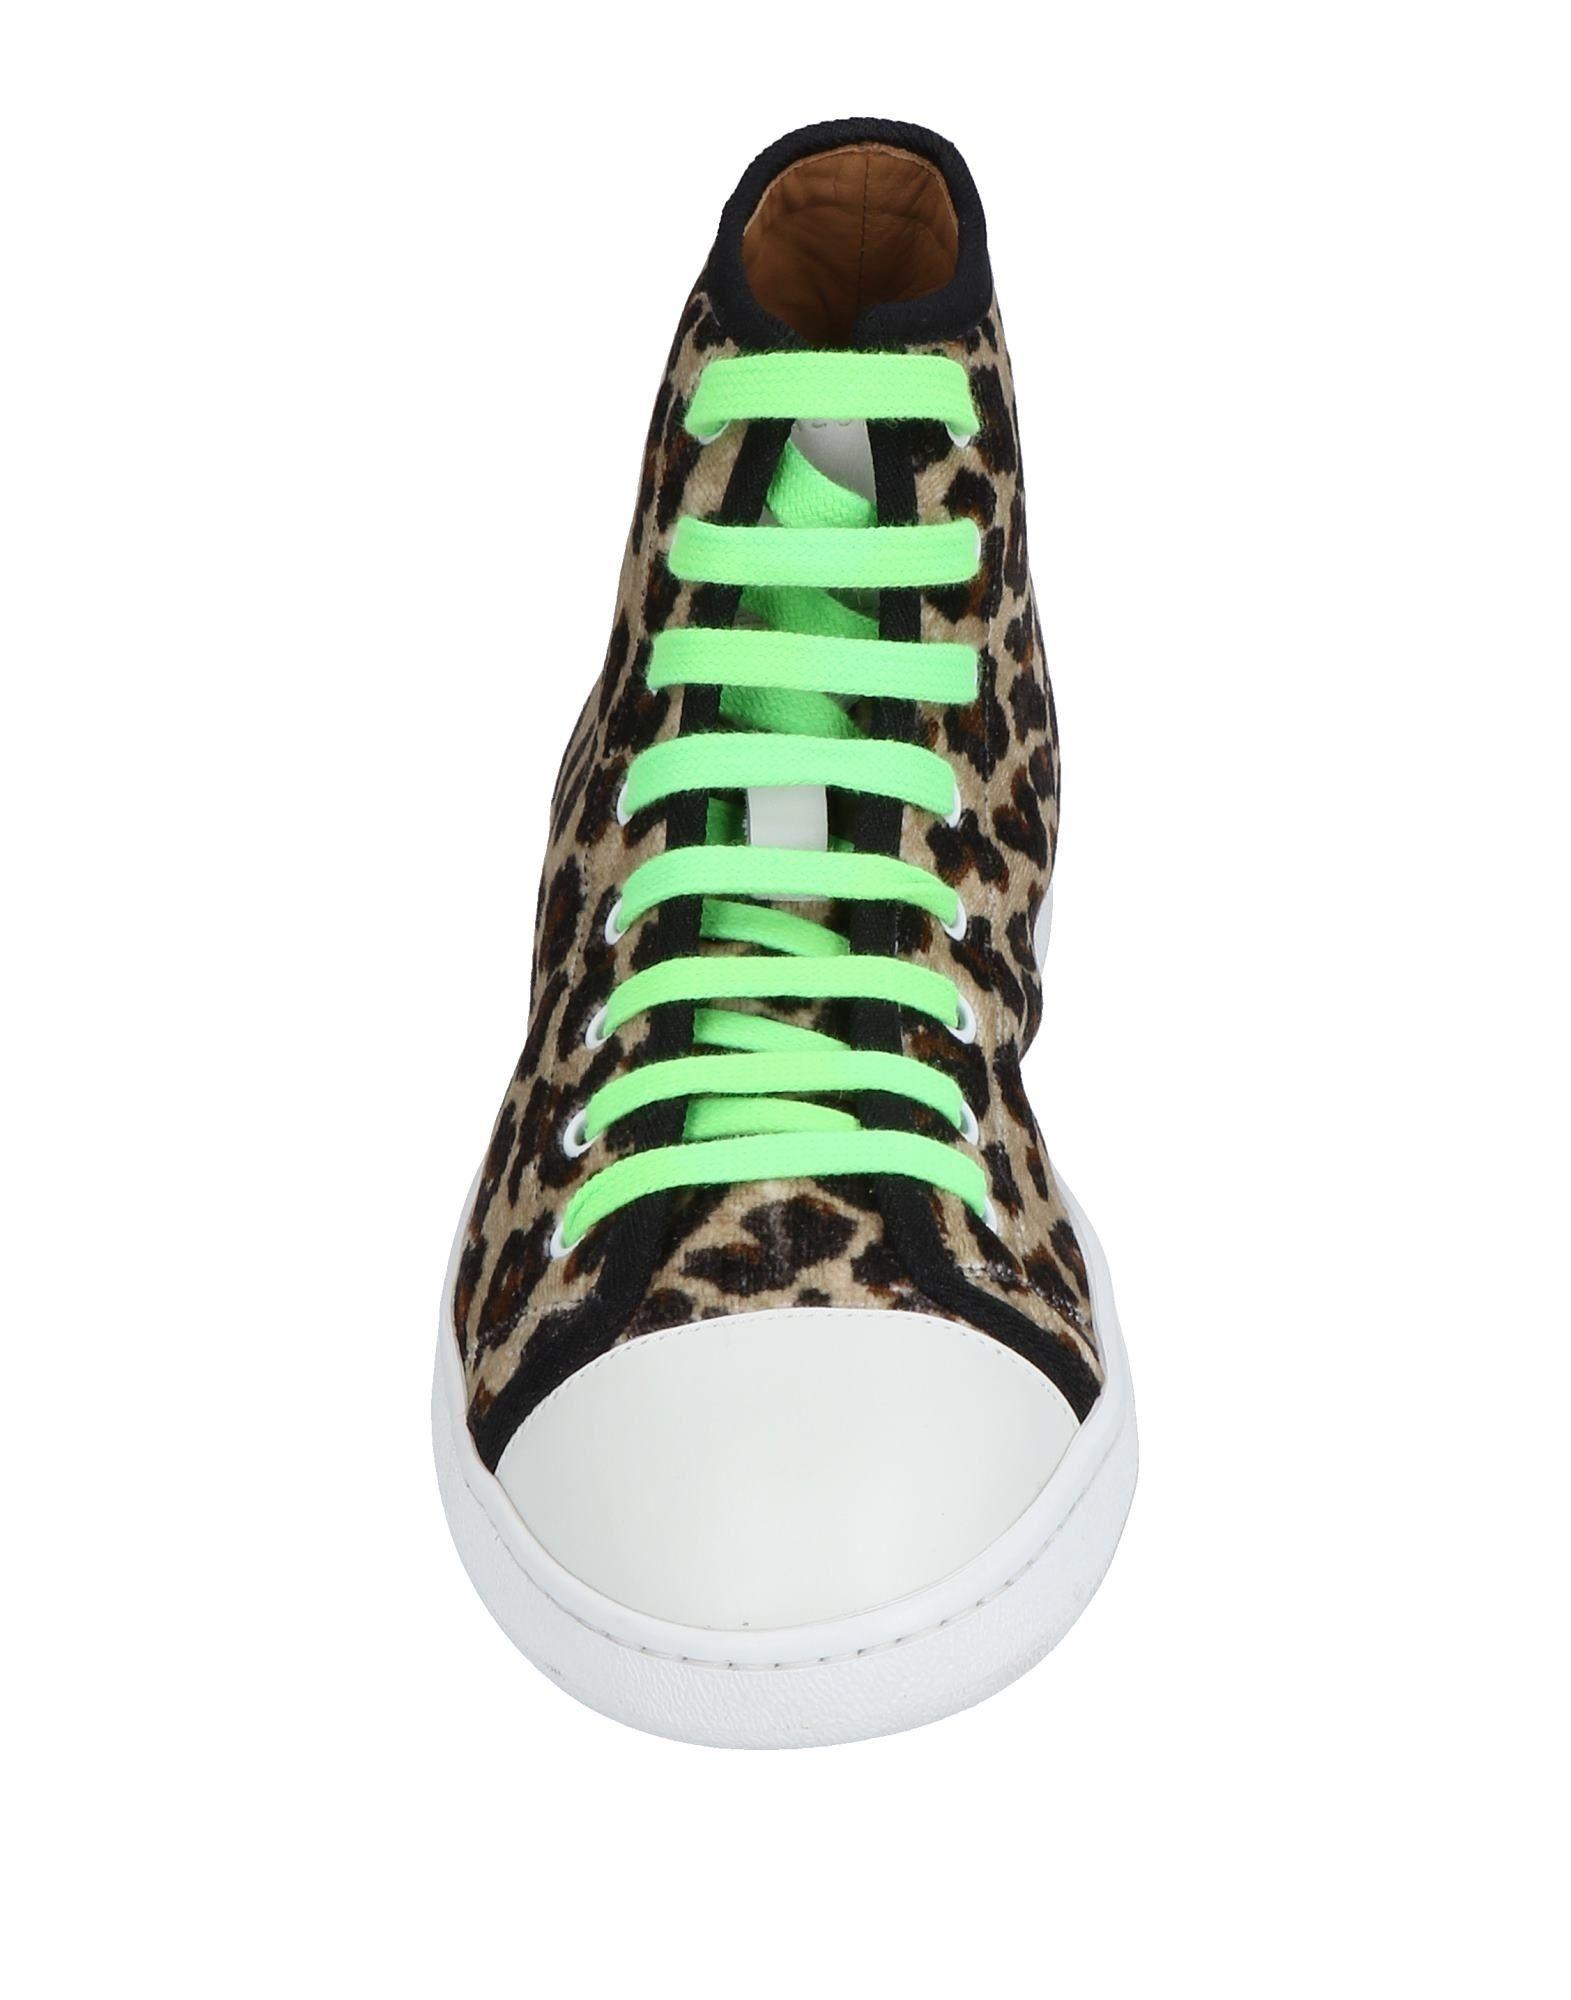 Marc Jacobs Sneakers Qualität Herren  11492850VR Gute Qualität Sneakers beliebte Schuhe 3e9439